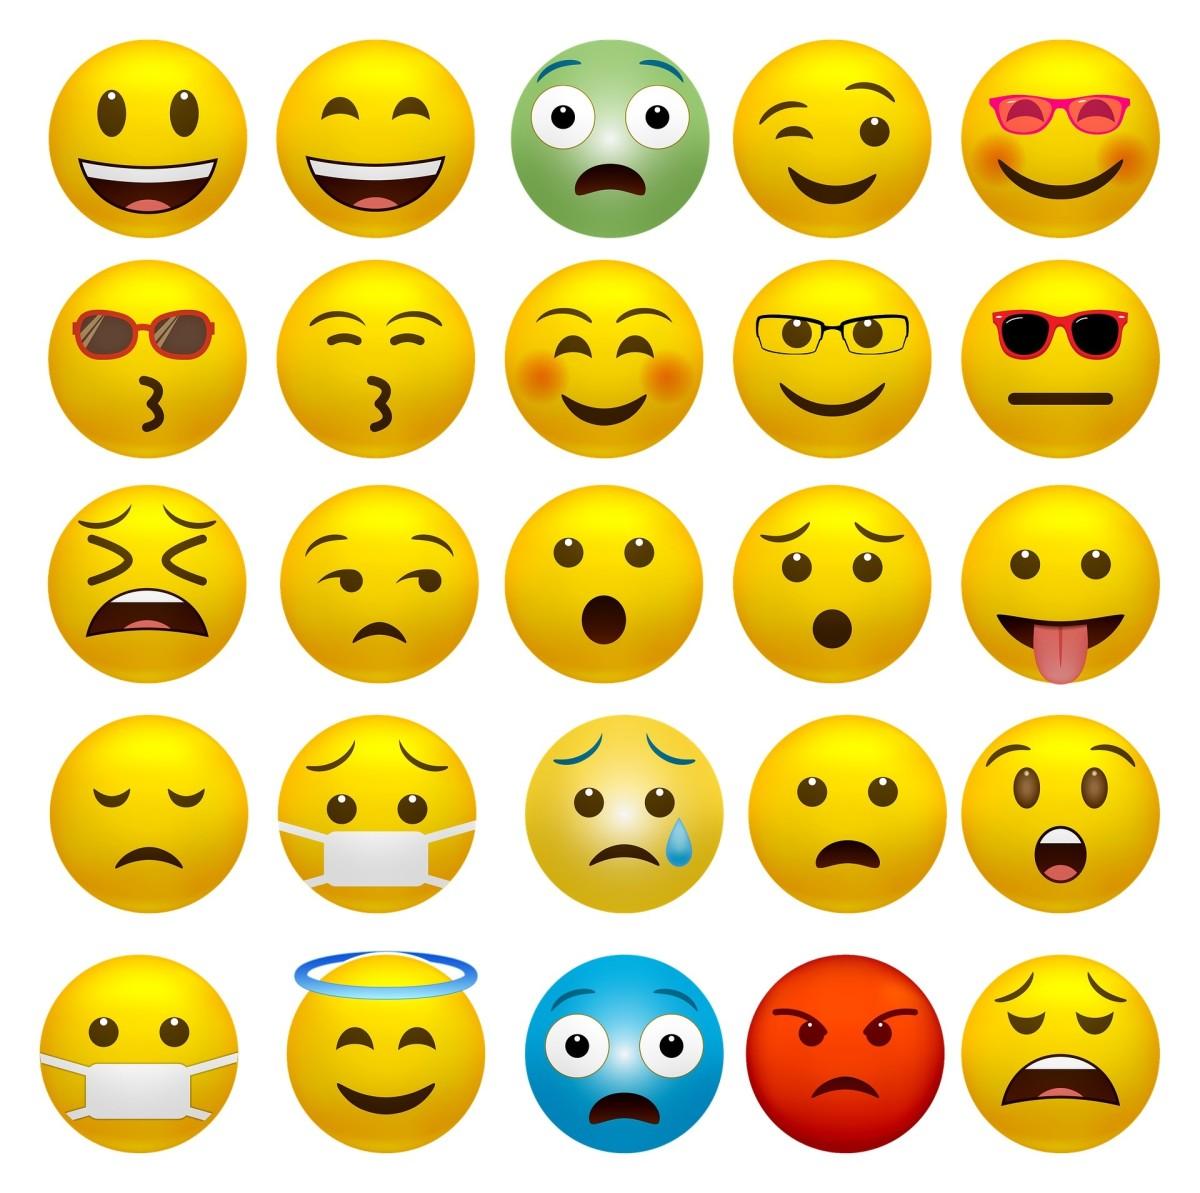 Sample emoji to frame the storyboard